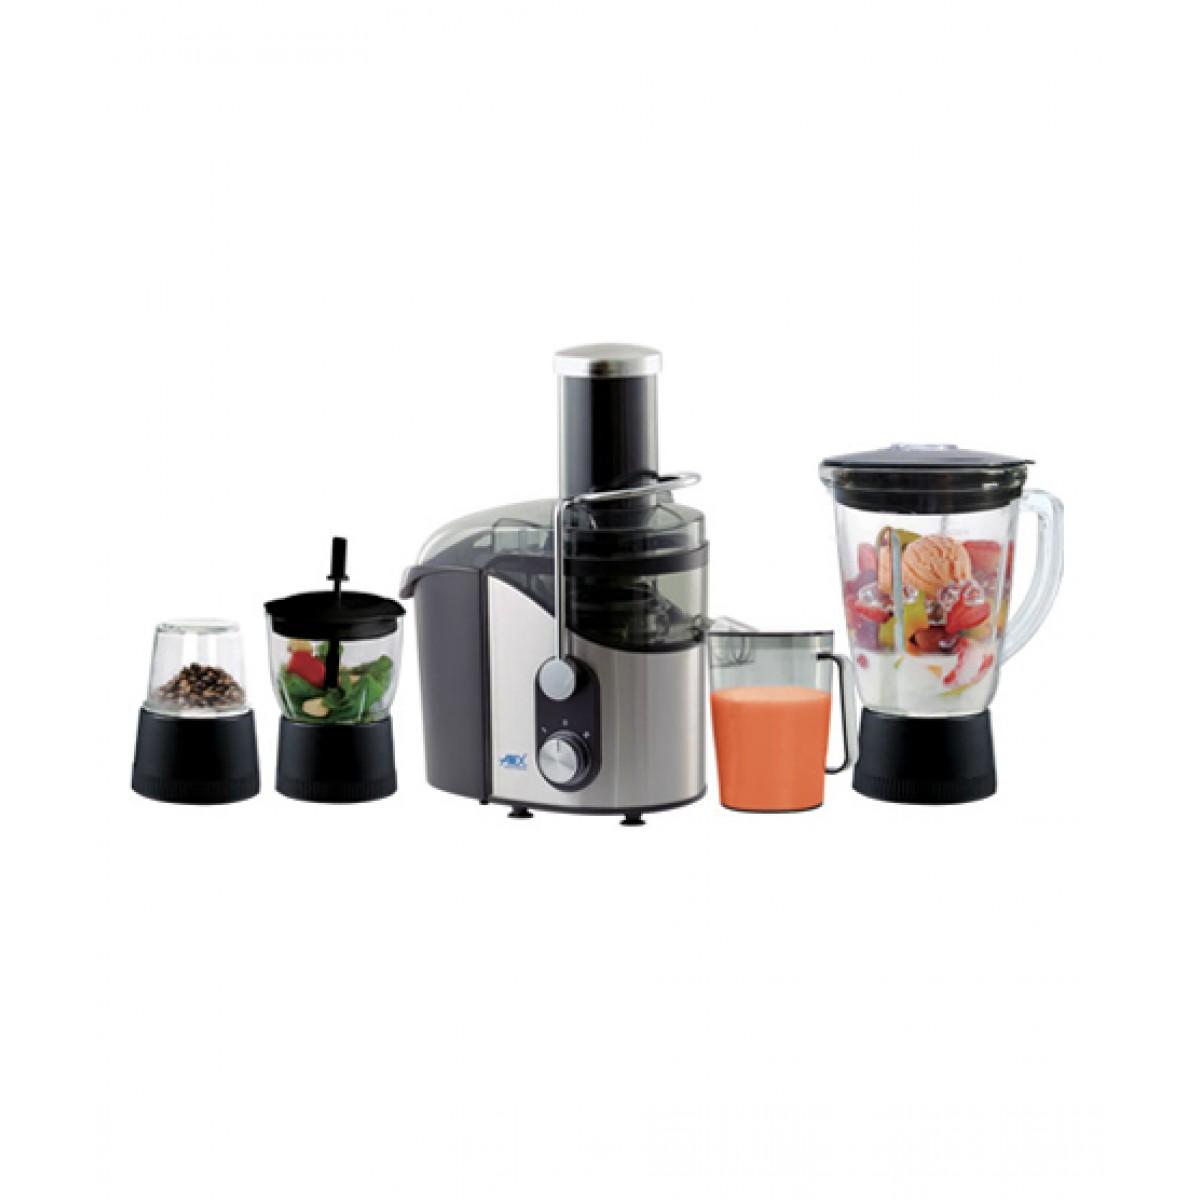 Anex Juicer Blender And Grinder Ag 188 Price In Pakistan Buy